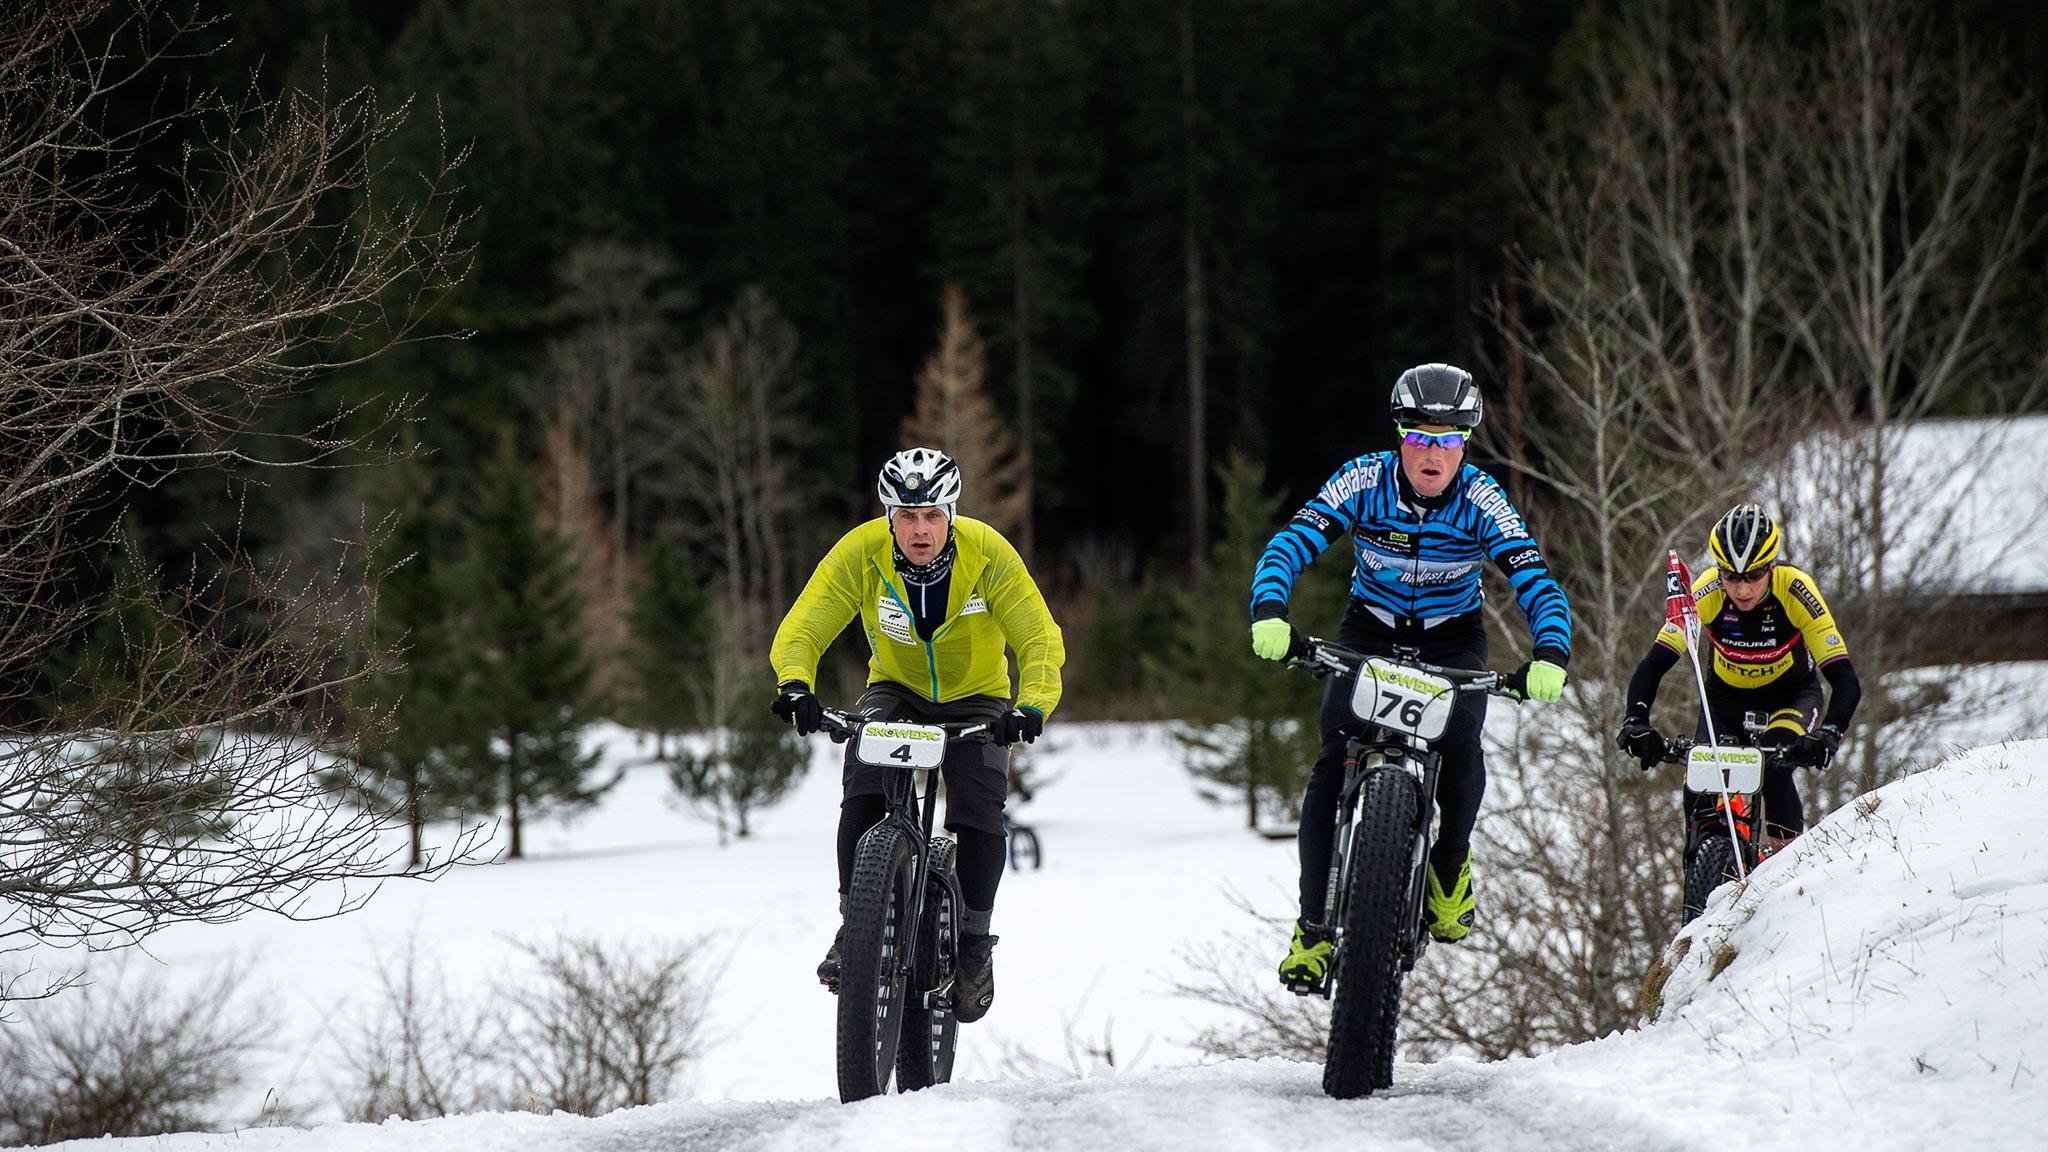 Snow_Epic_2015_Brentjens_Hoydahl_Copyright_SnowEpic_VojoMag-1